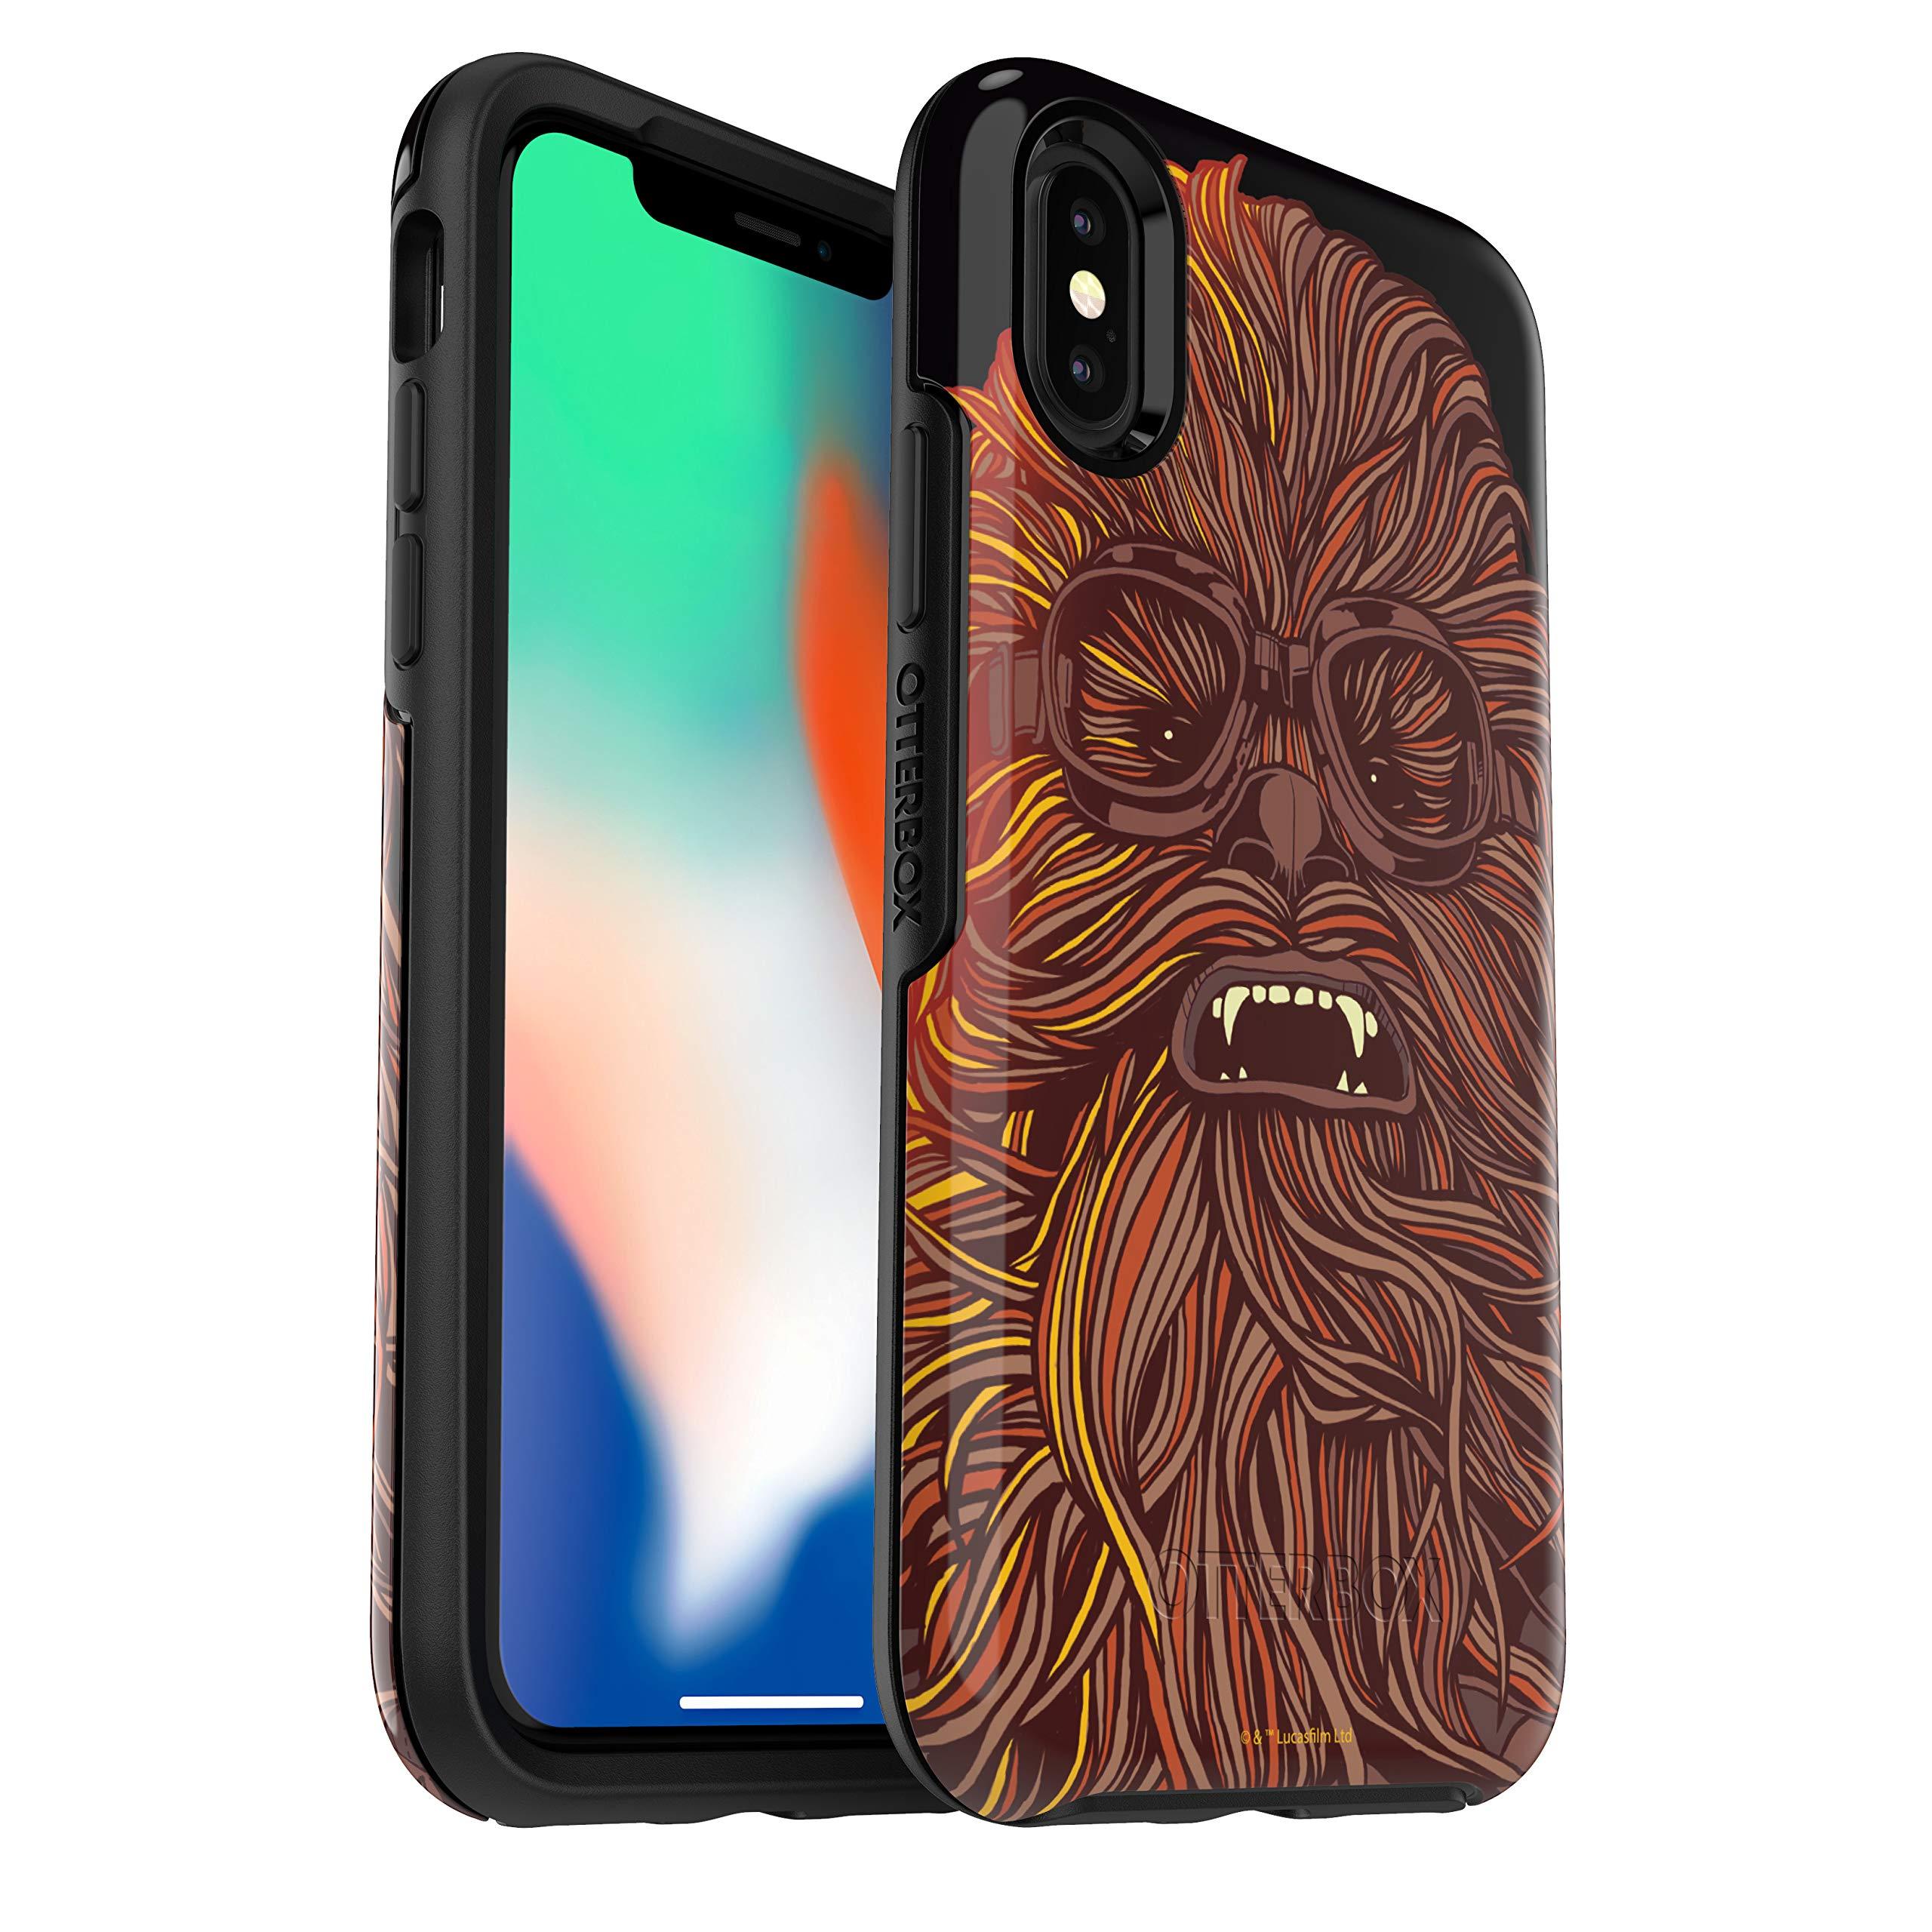 Funda OtterBox Symmetry Star Wars iPhone Xs/X Chewbacca